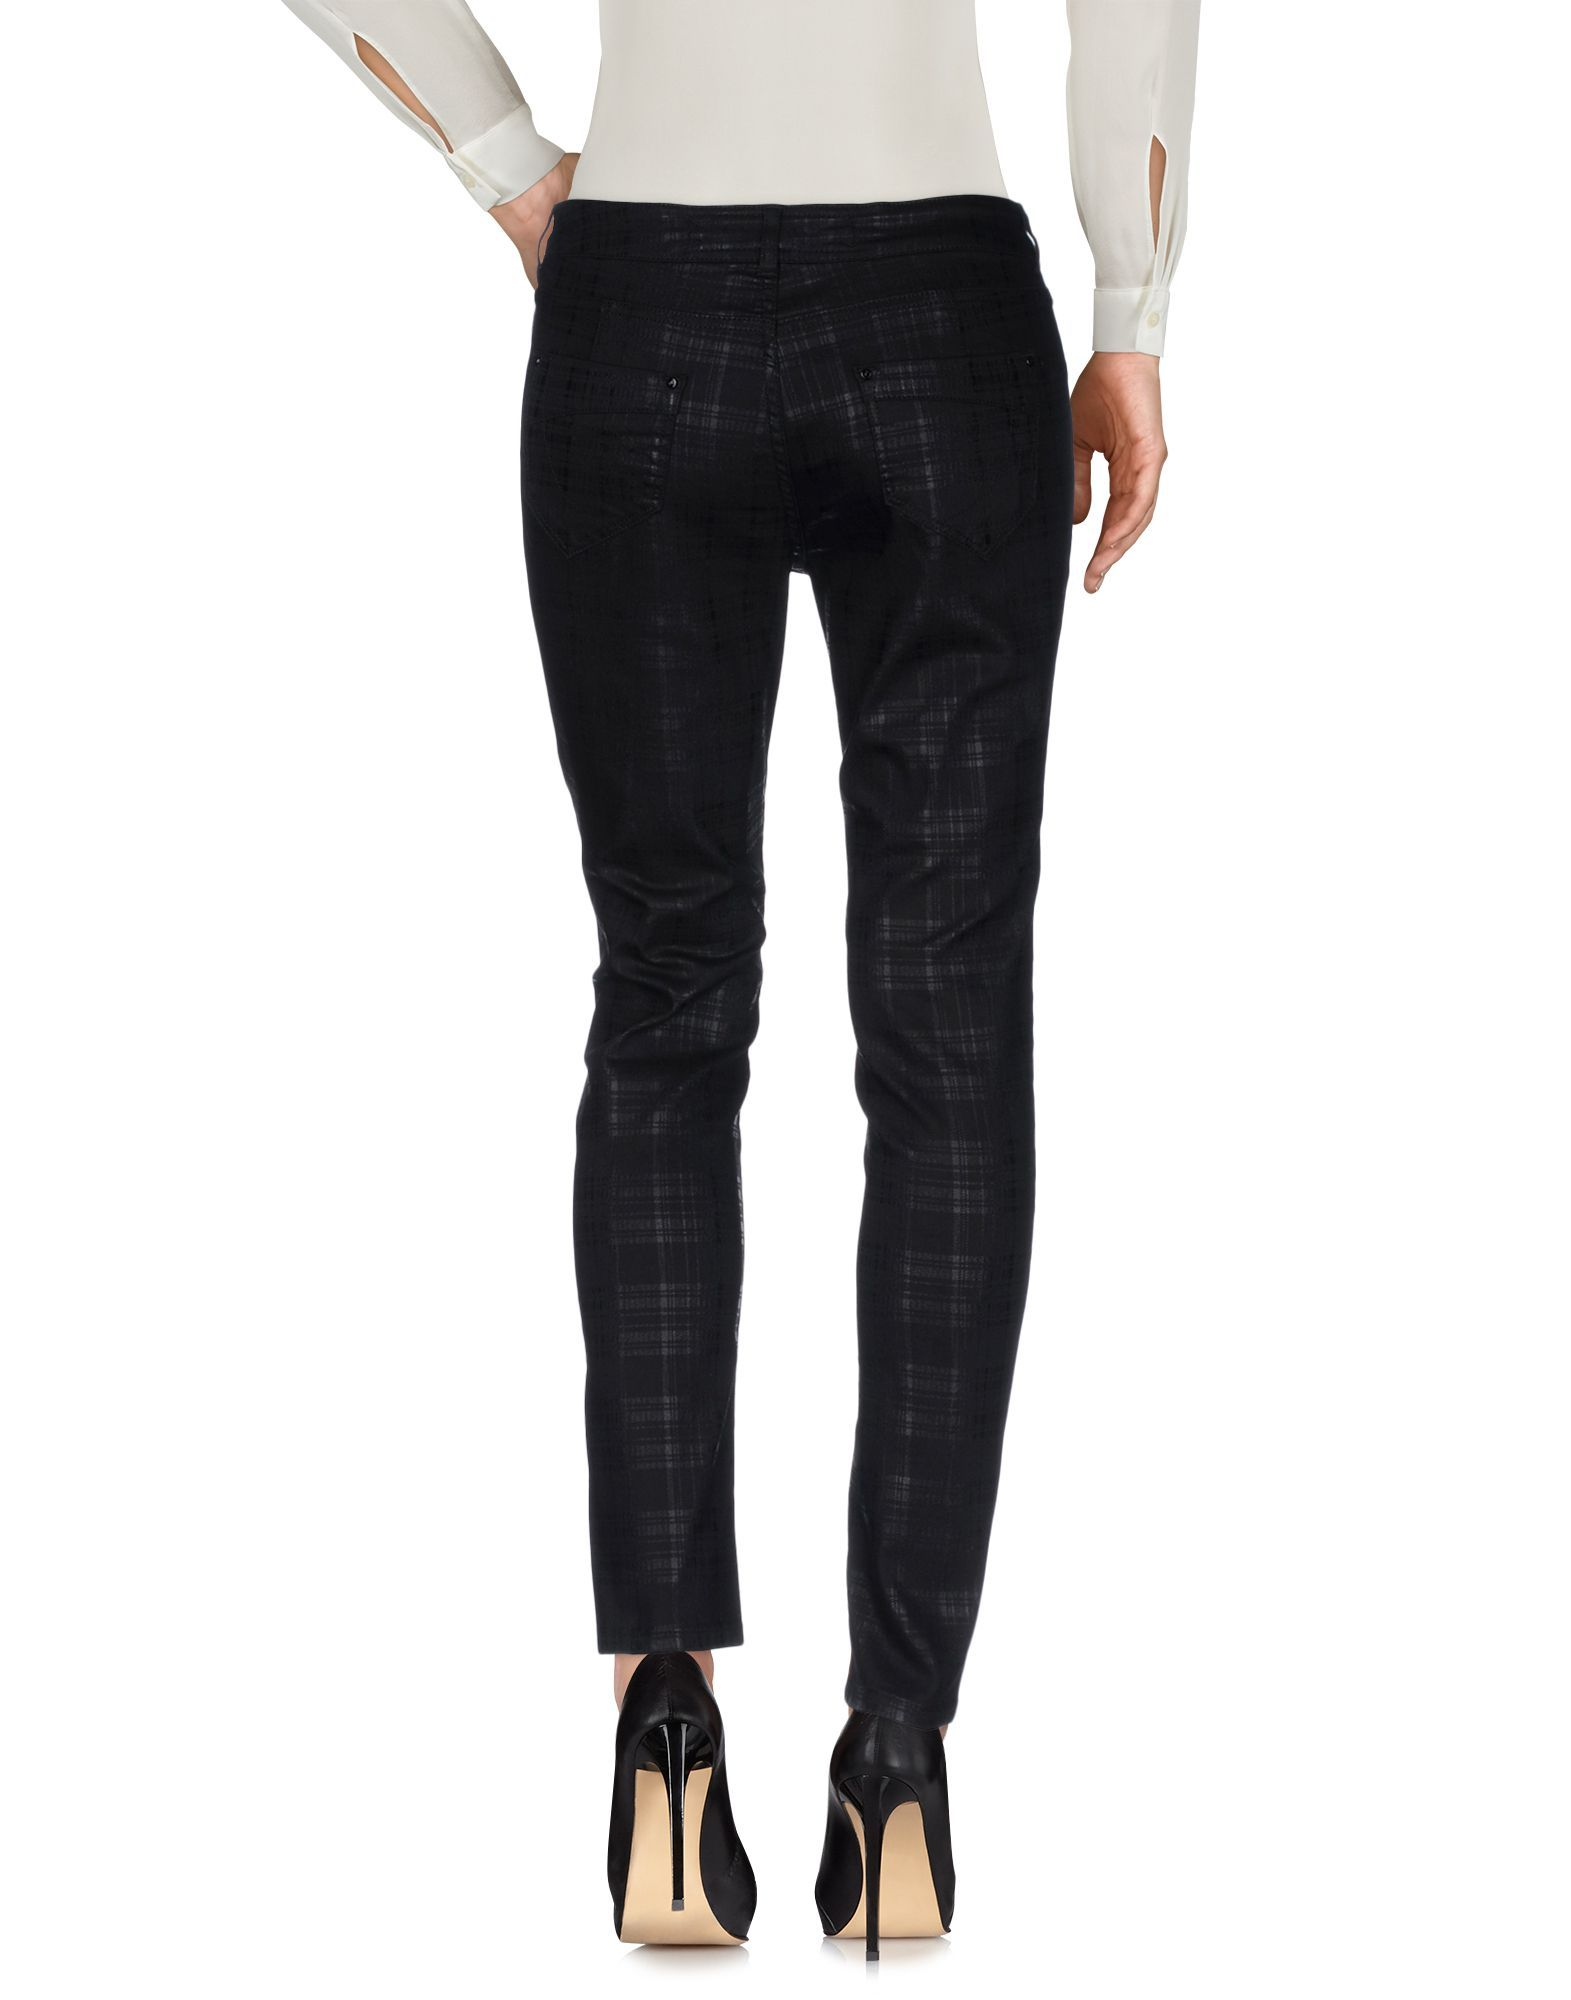 Karen Millen Black Cotton Tapered Leg Trousers